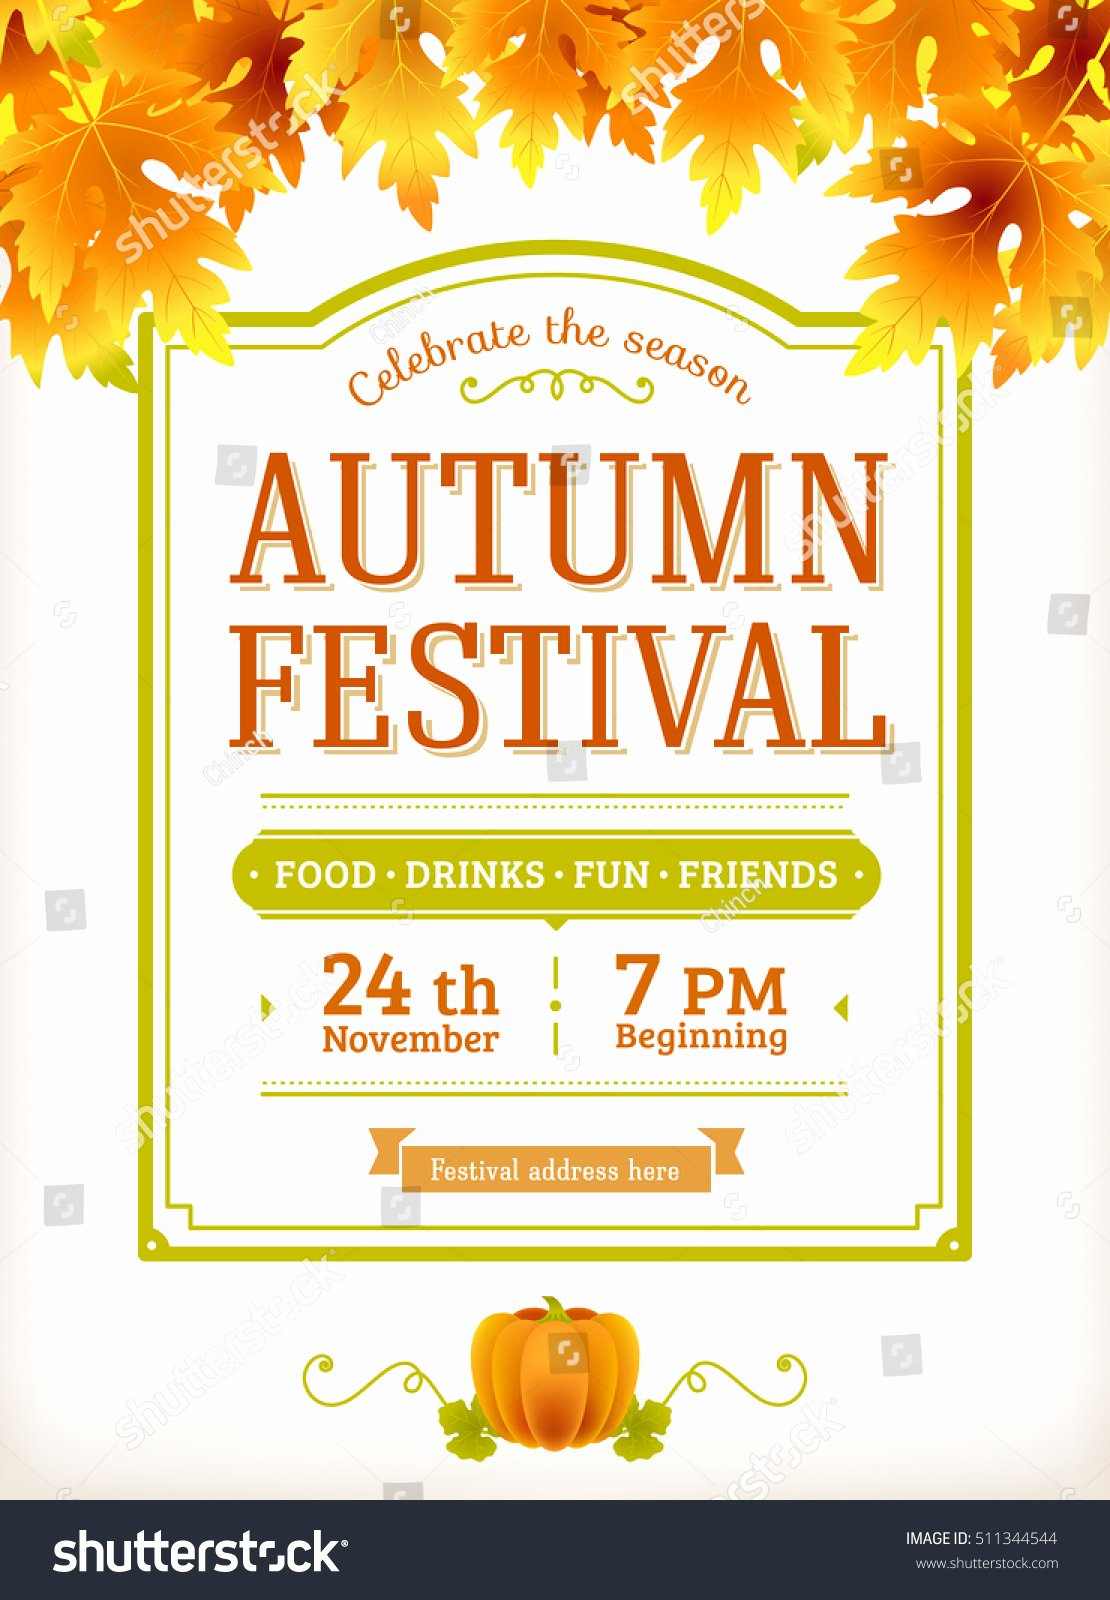 Fall Party Invitation Template Fresh Autumn Festival Invitation Fall Party Template Stock